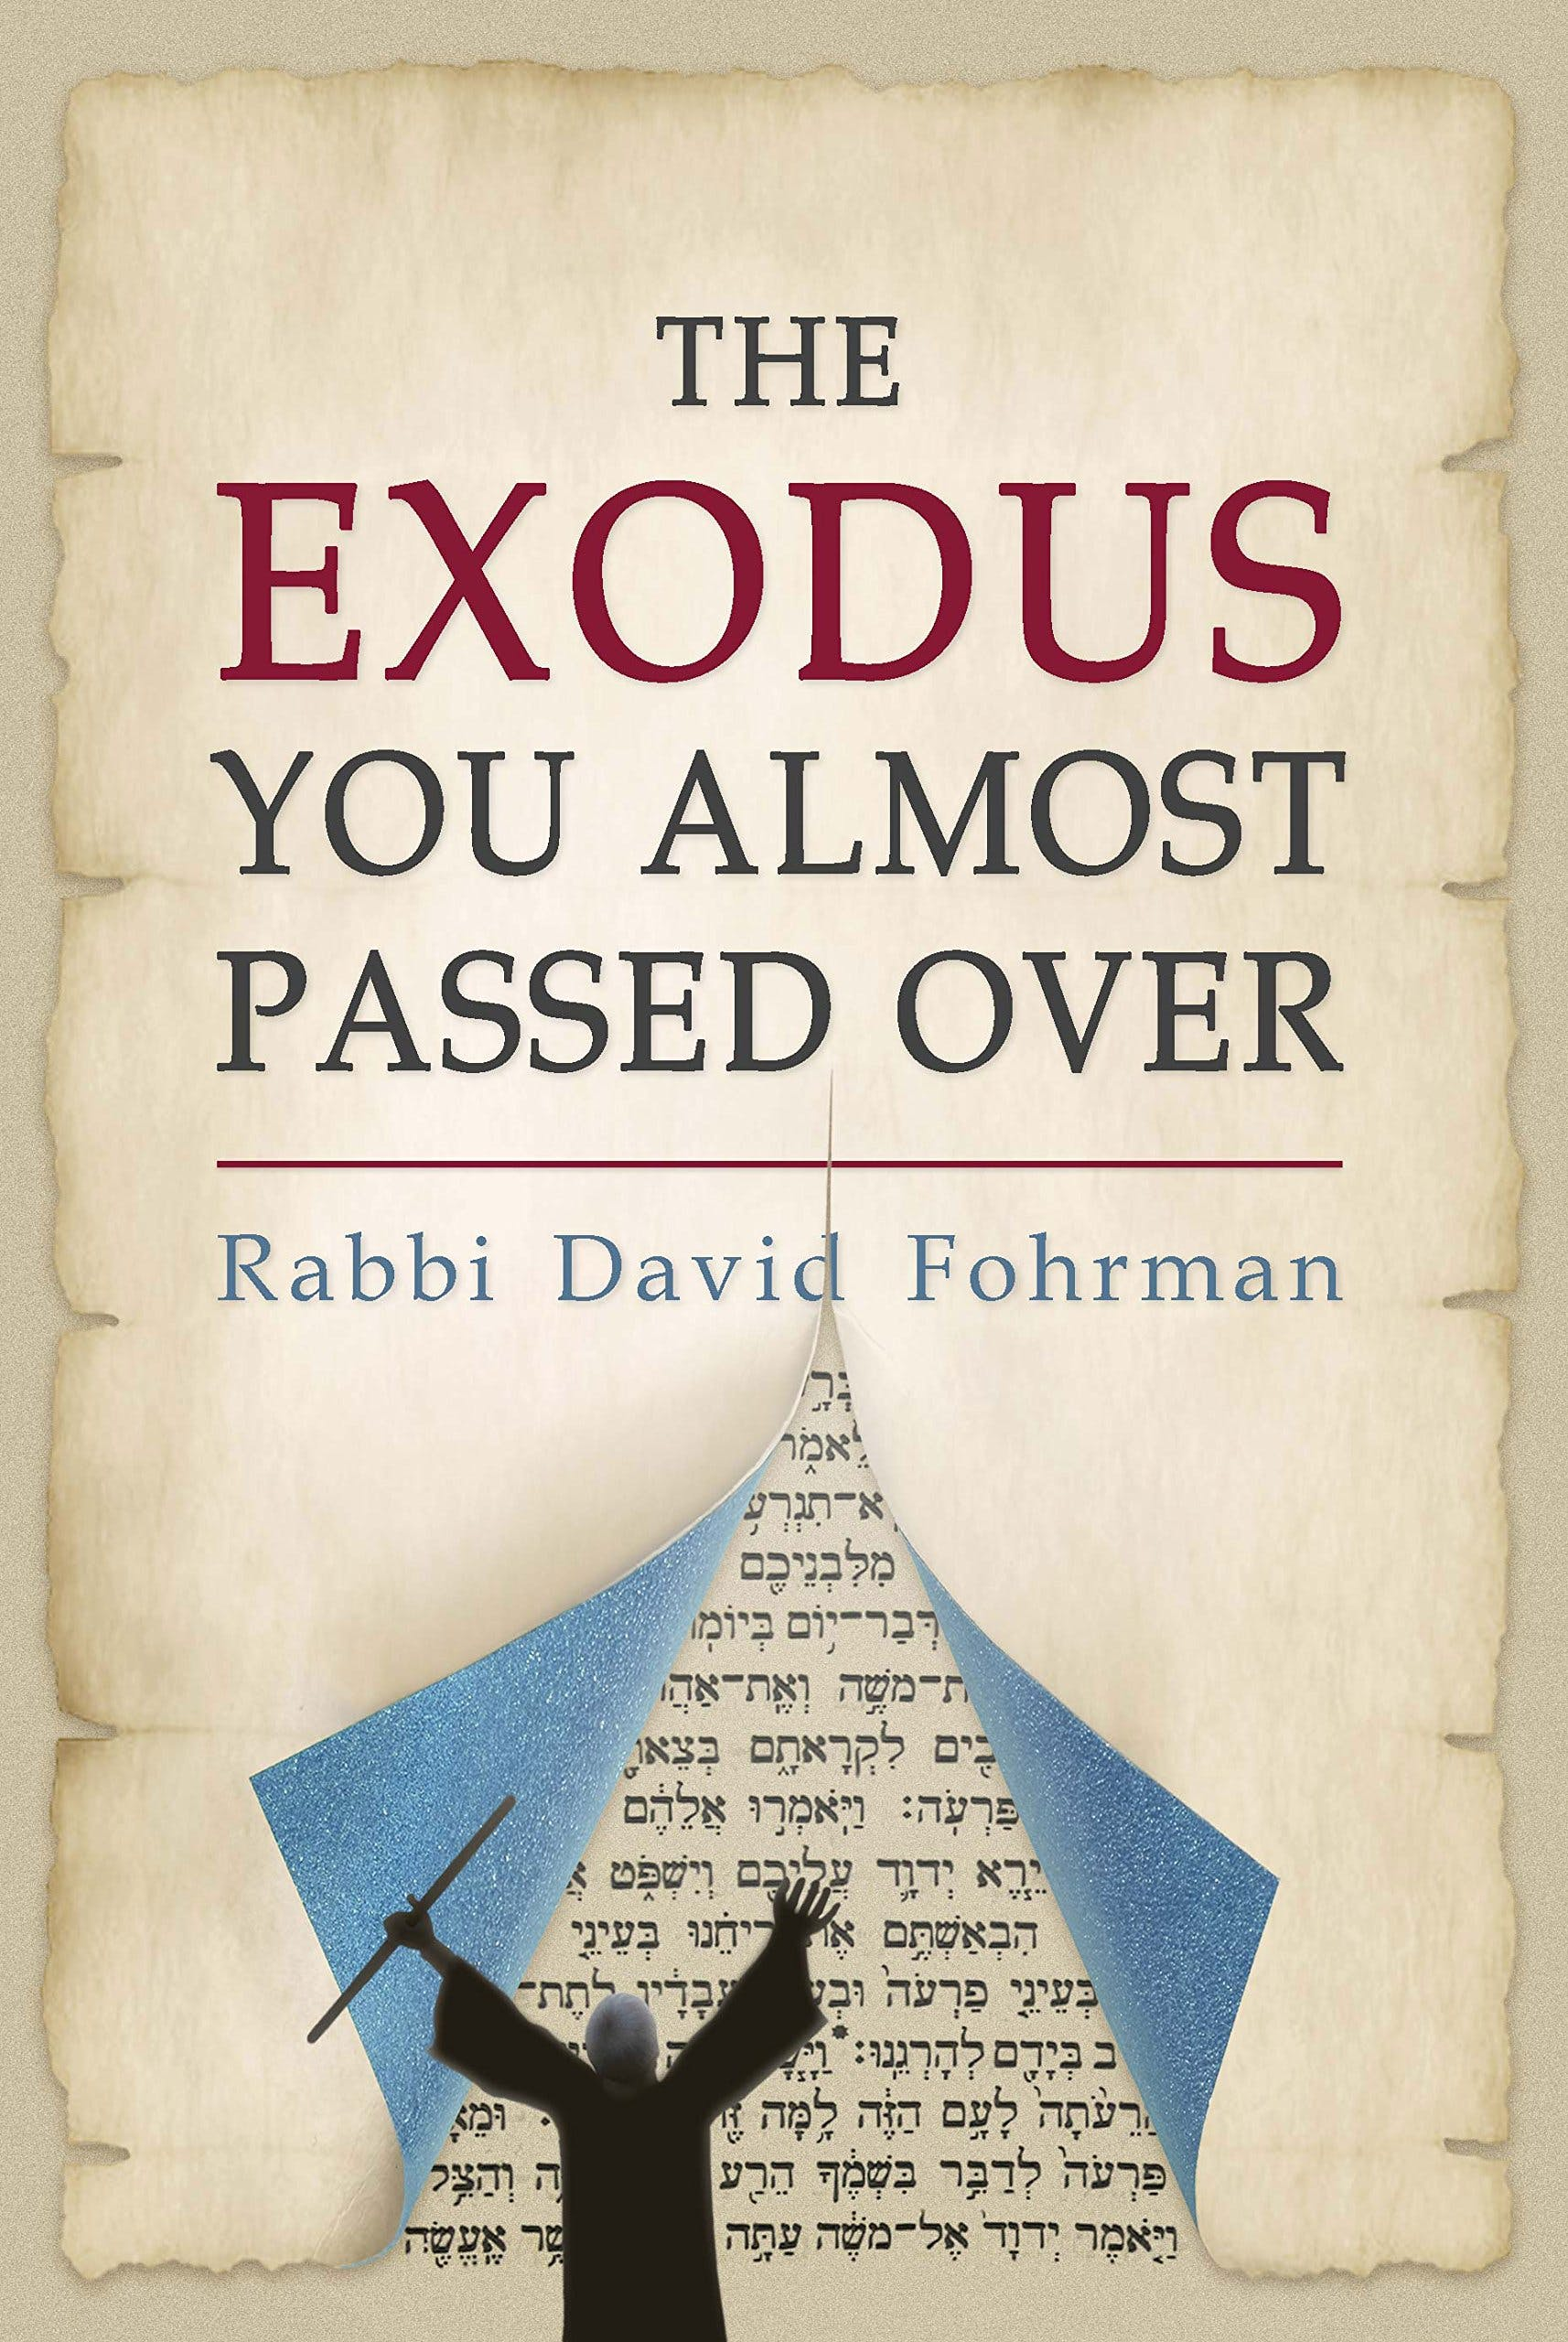 Book for Seder Service